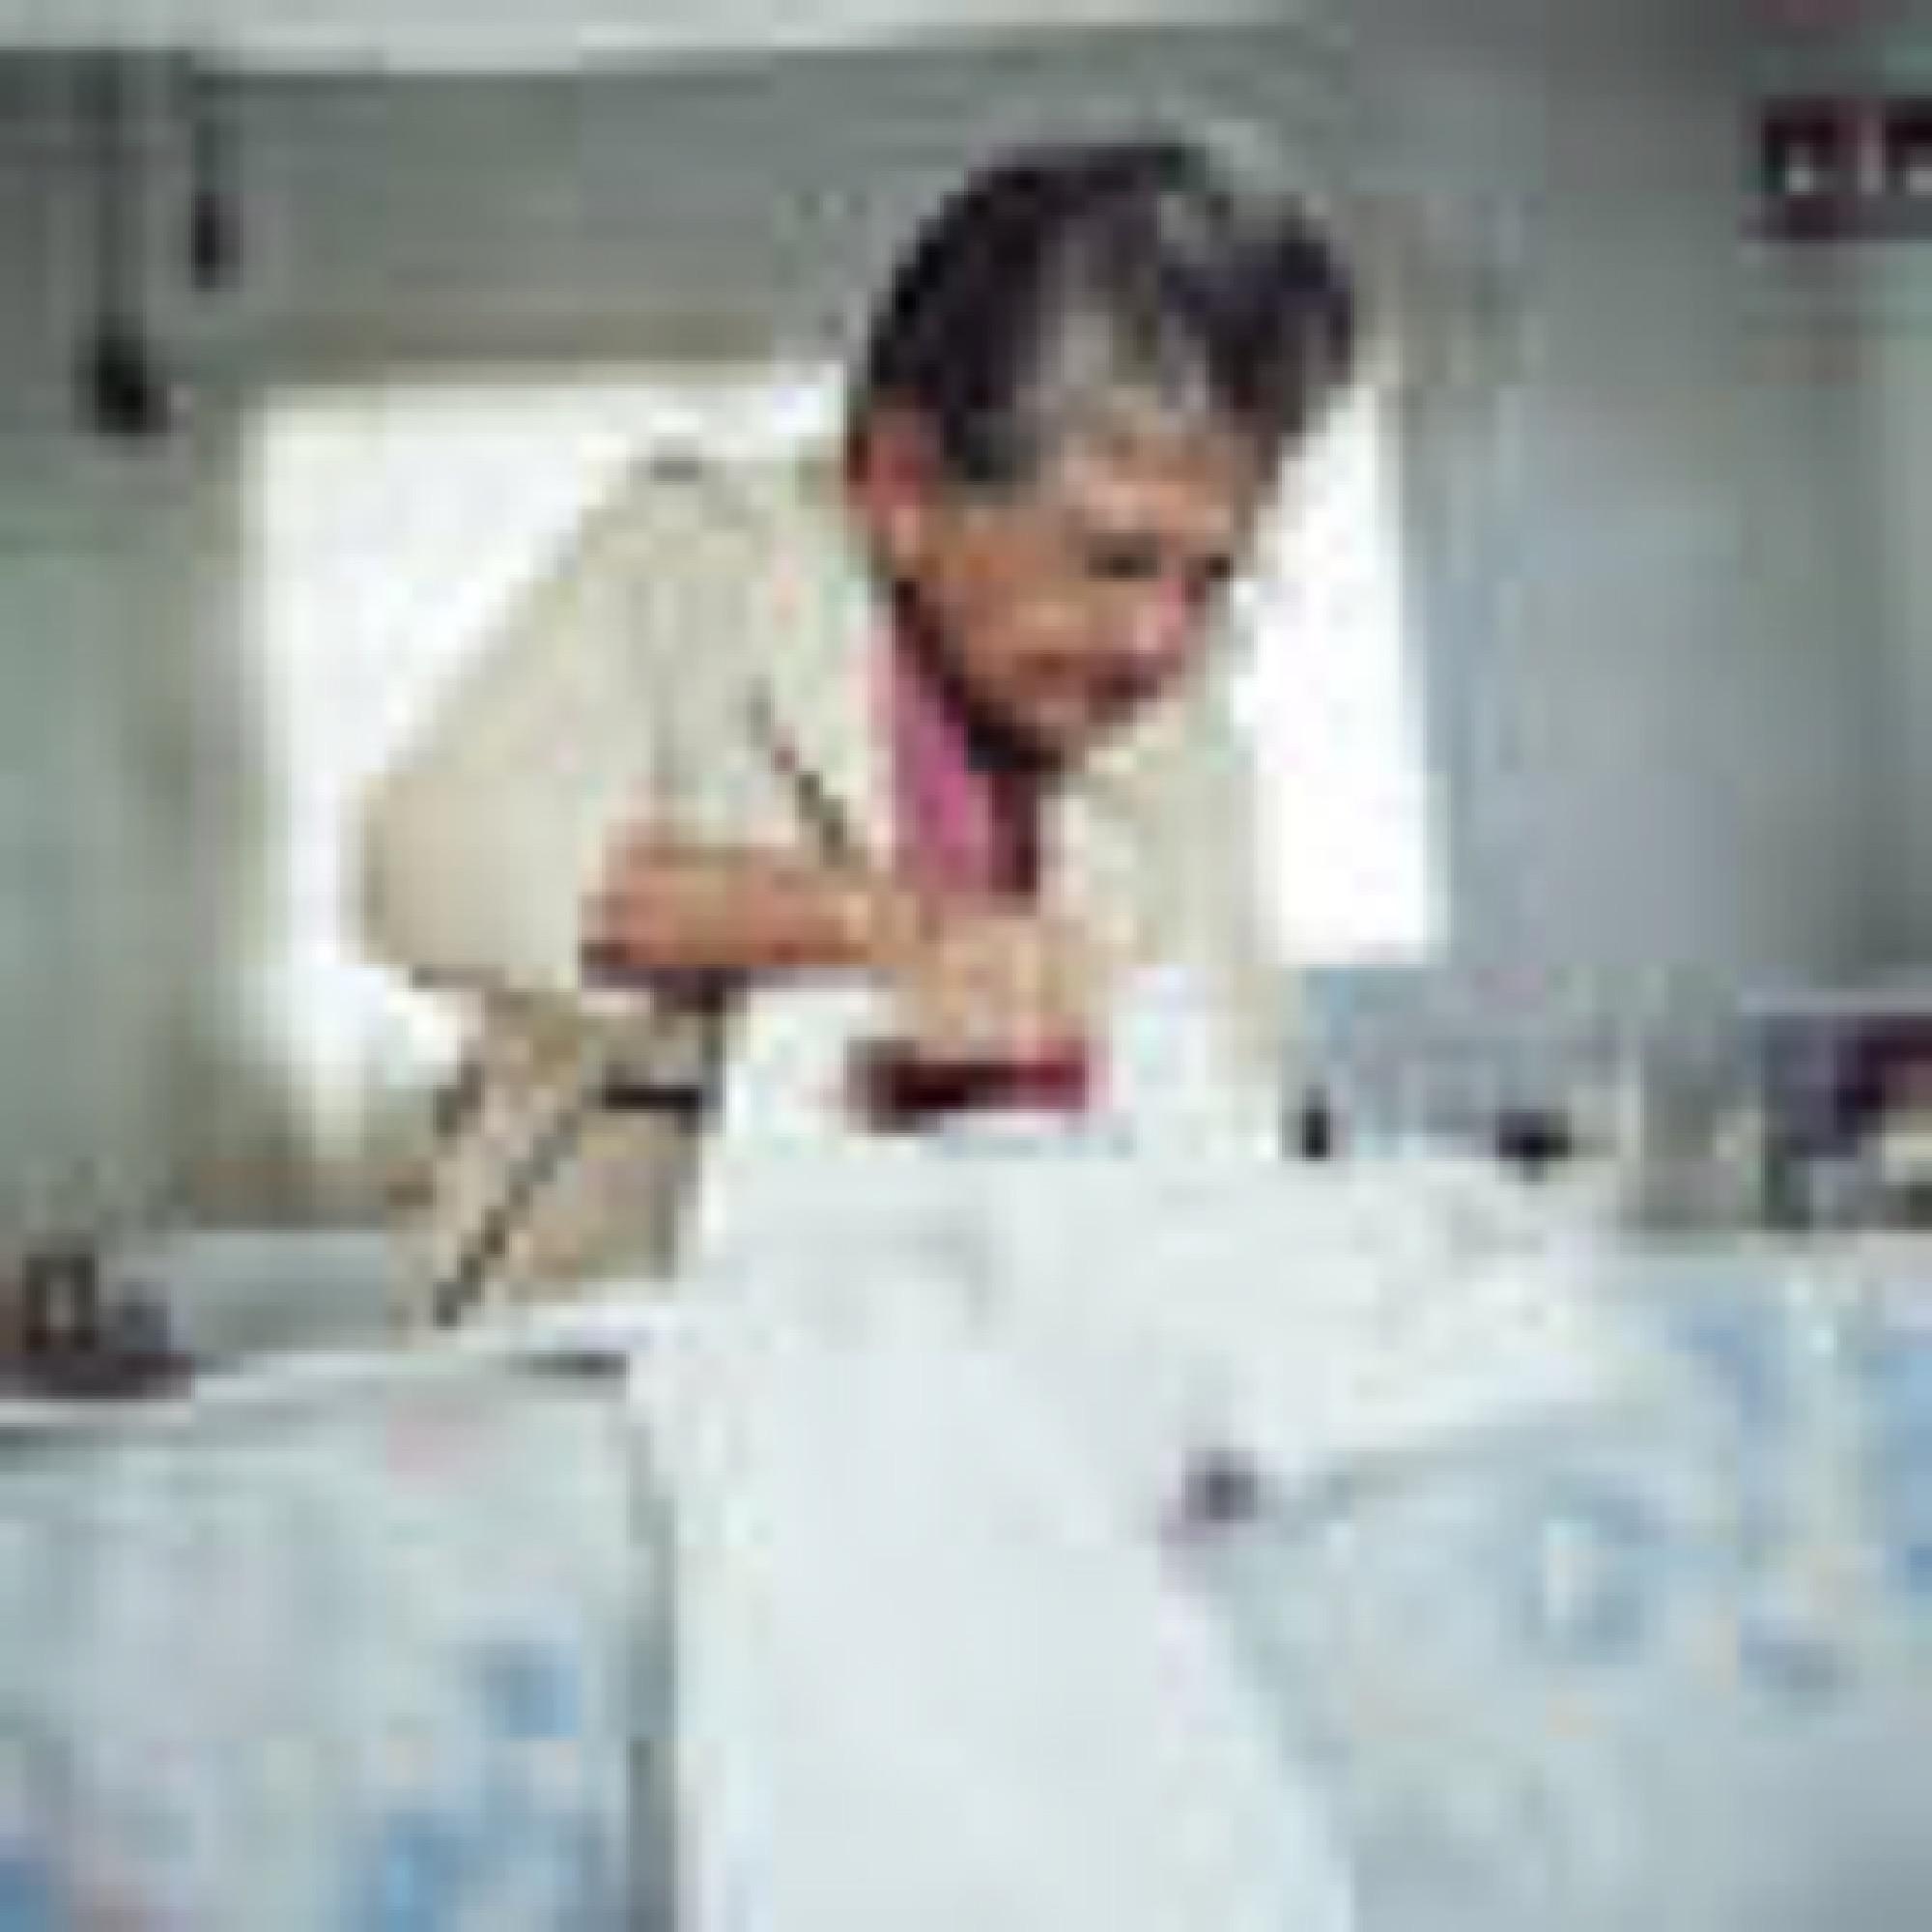 Querida Abuela - Dear Grandmother.